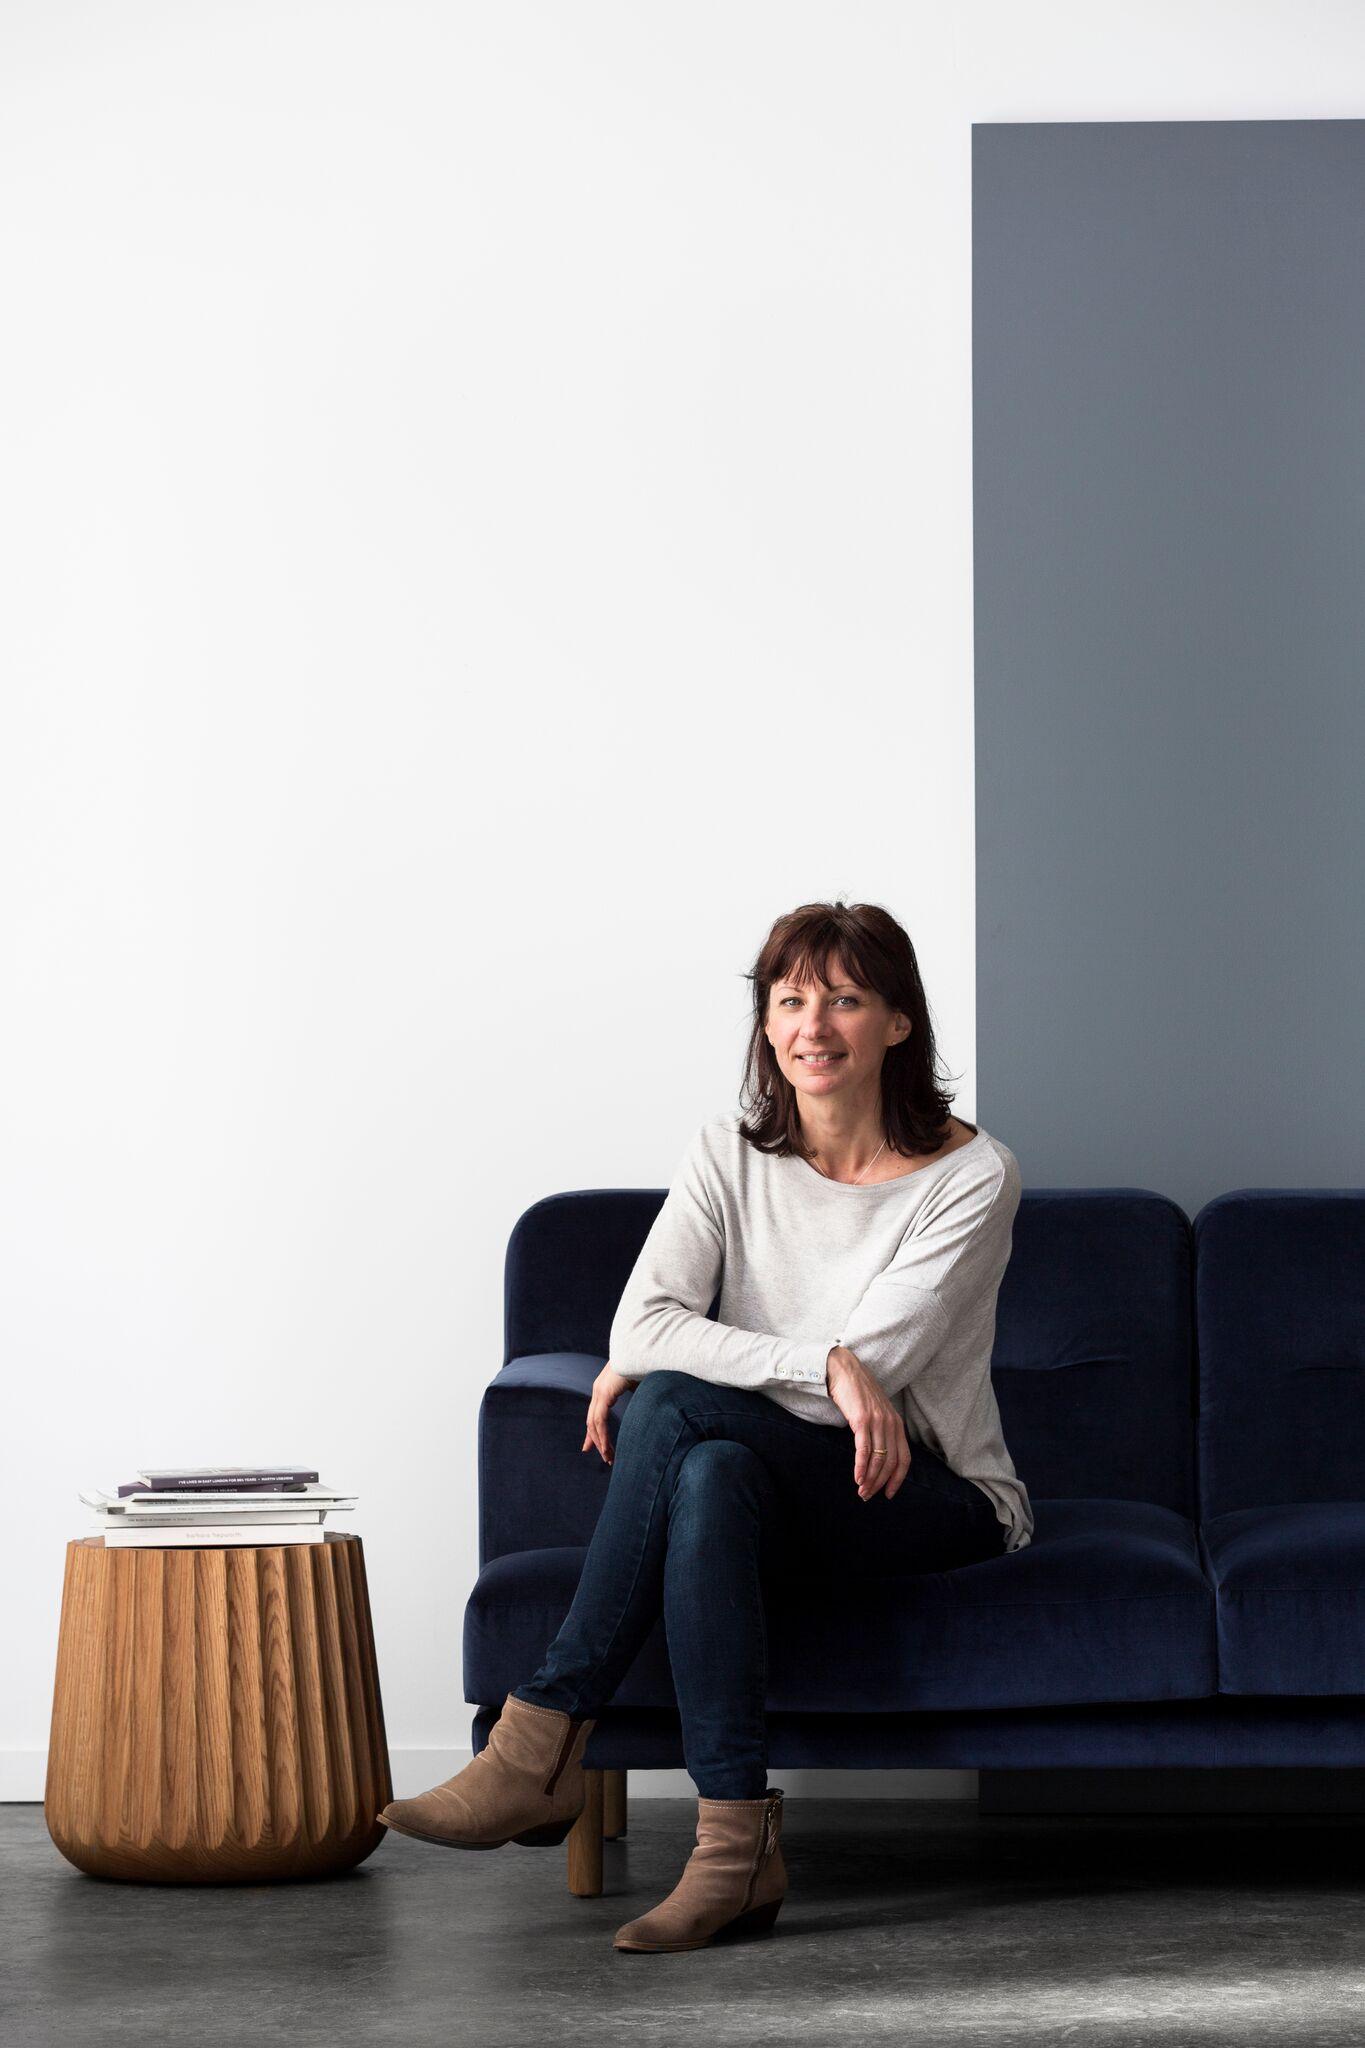 Gallery Of Anaca Studio Local Australian Furniture Design Collingwood, Melbourne Image 1